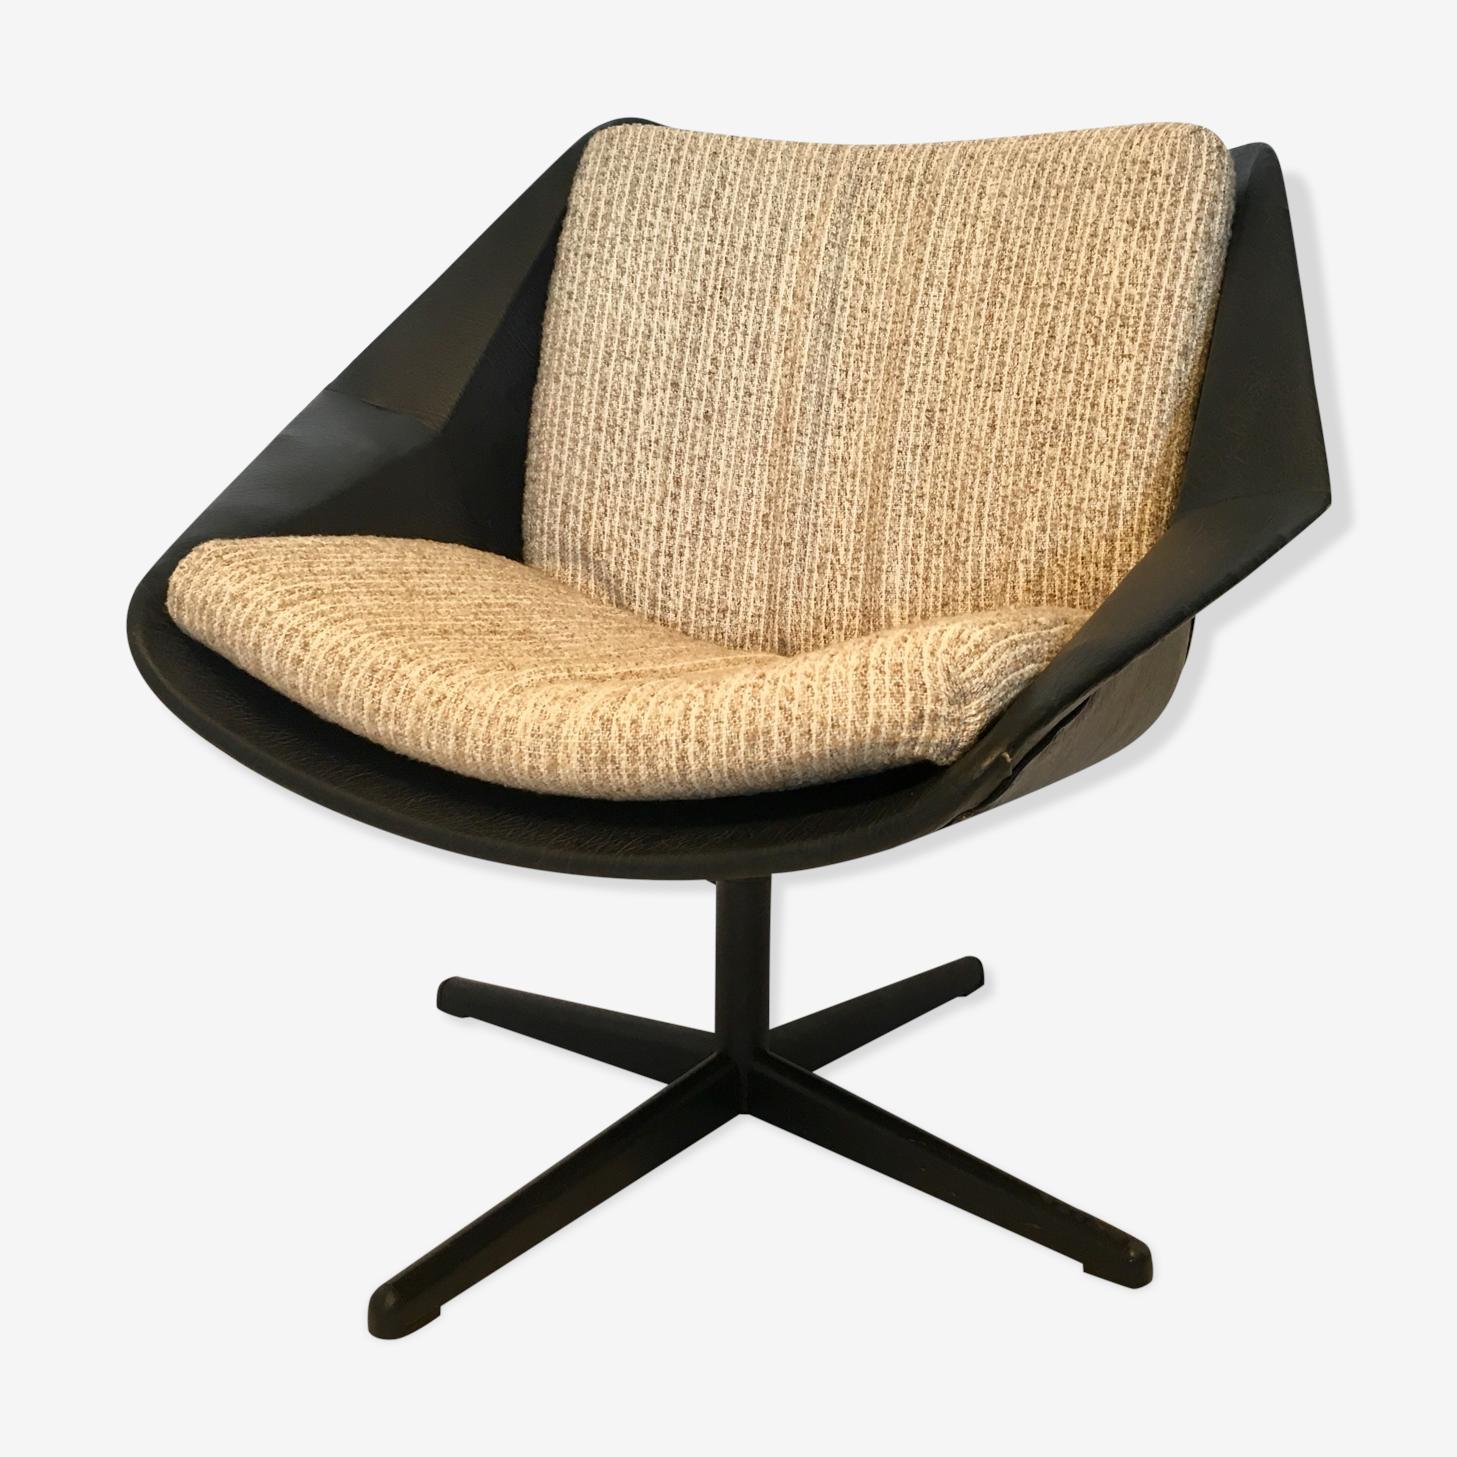 FM08 armchair by Pastoe design Cees Braakman